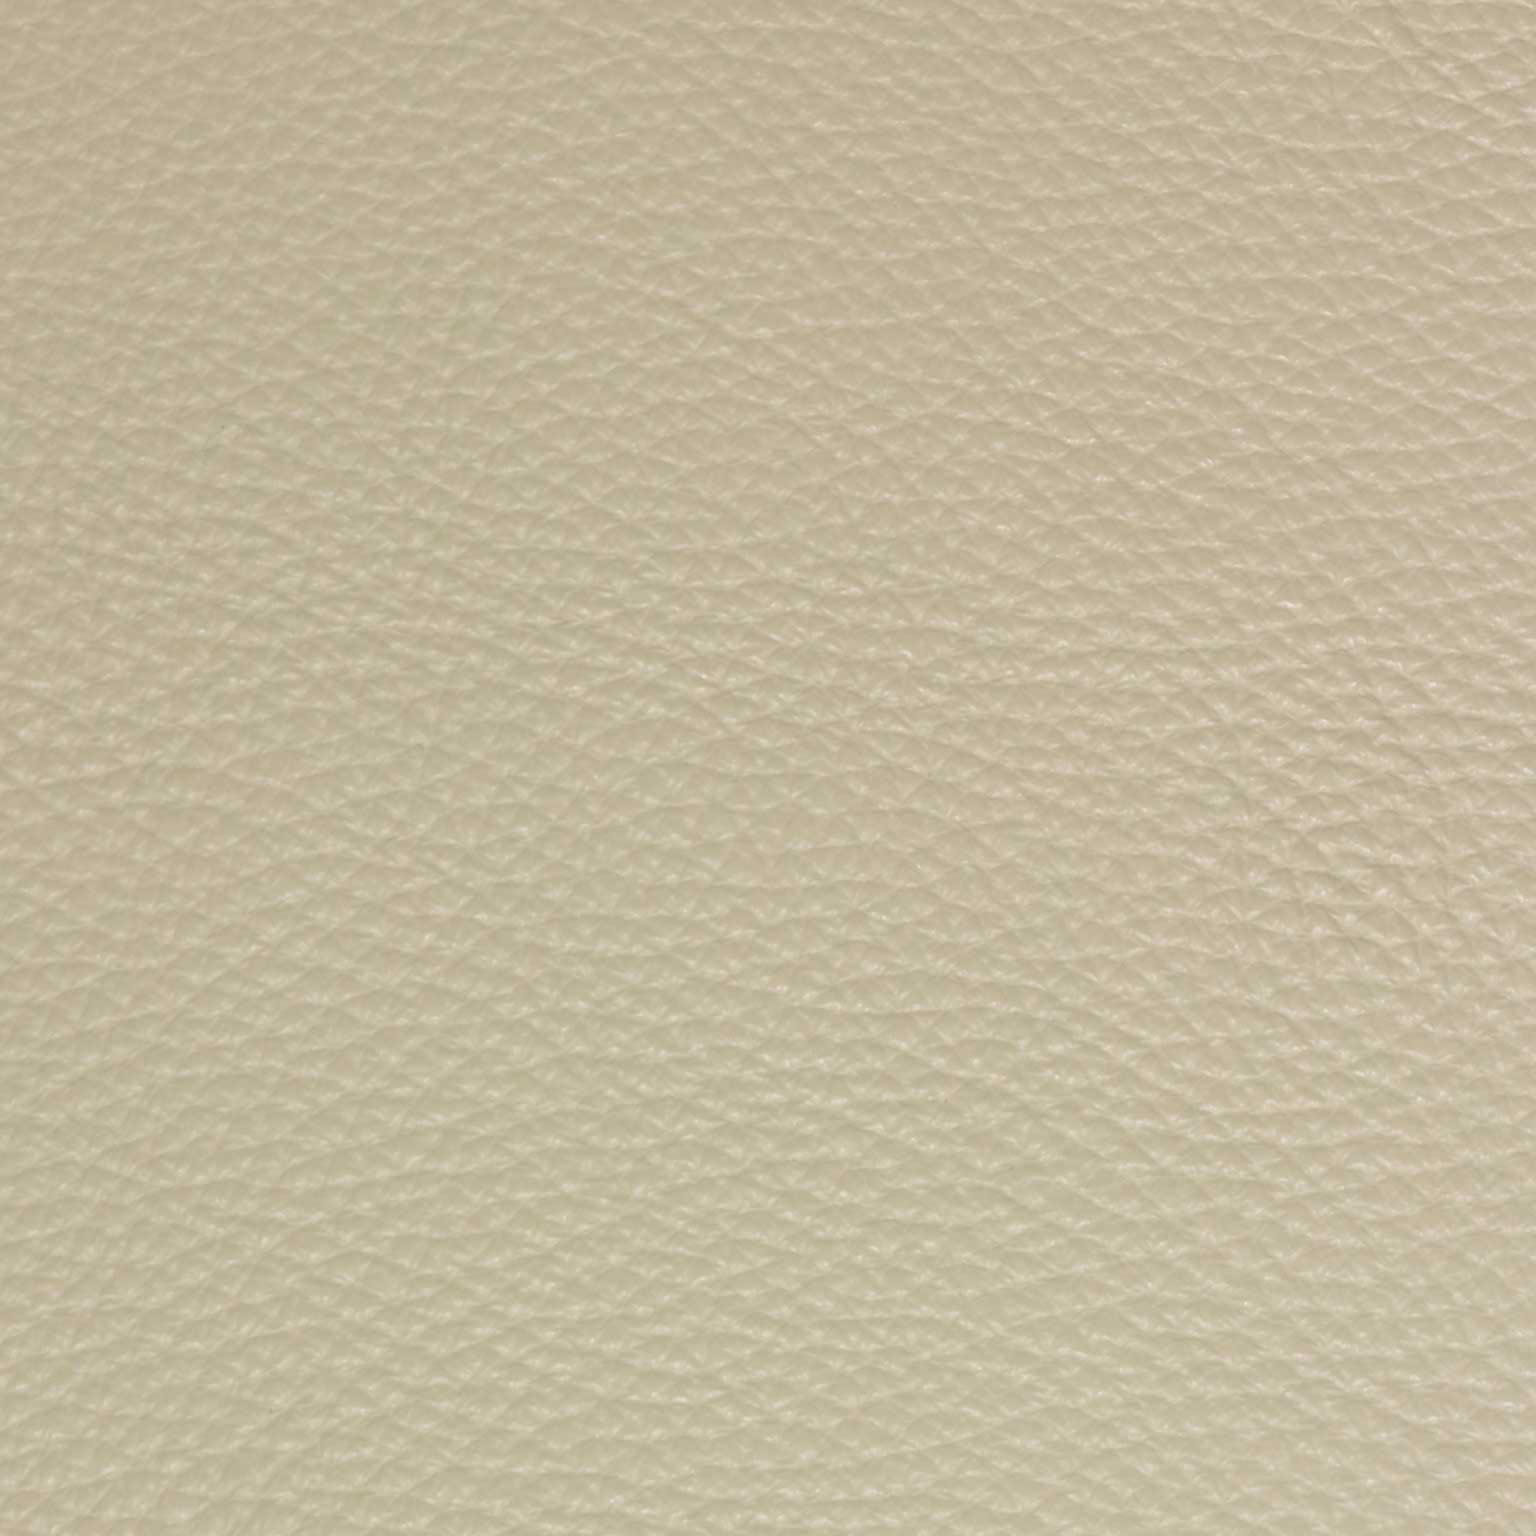 Ranchio leather_p11-007